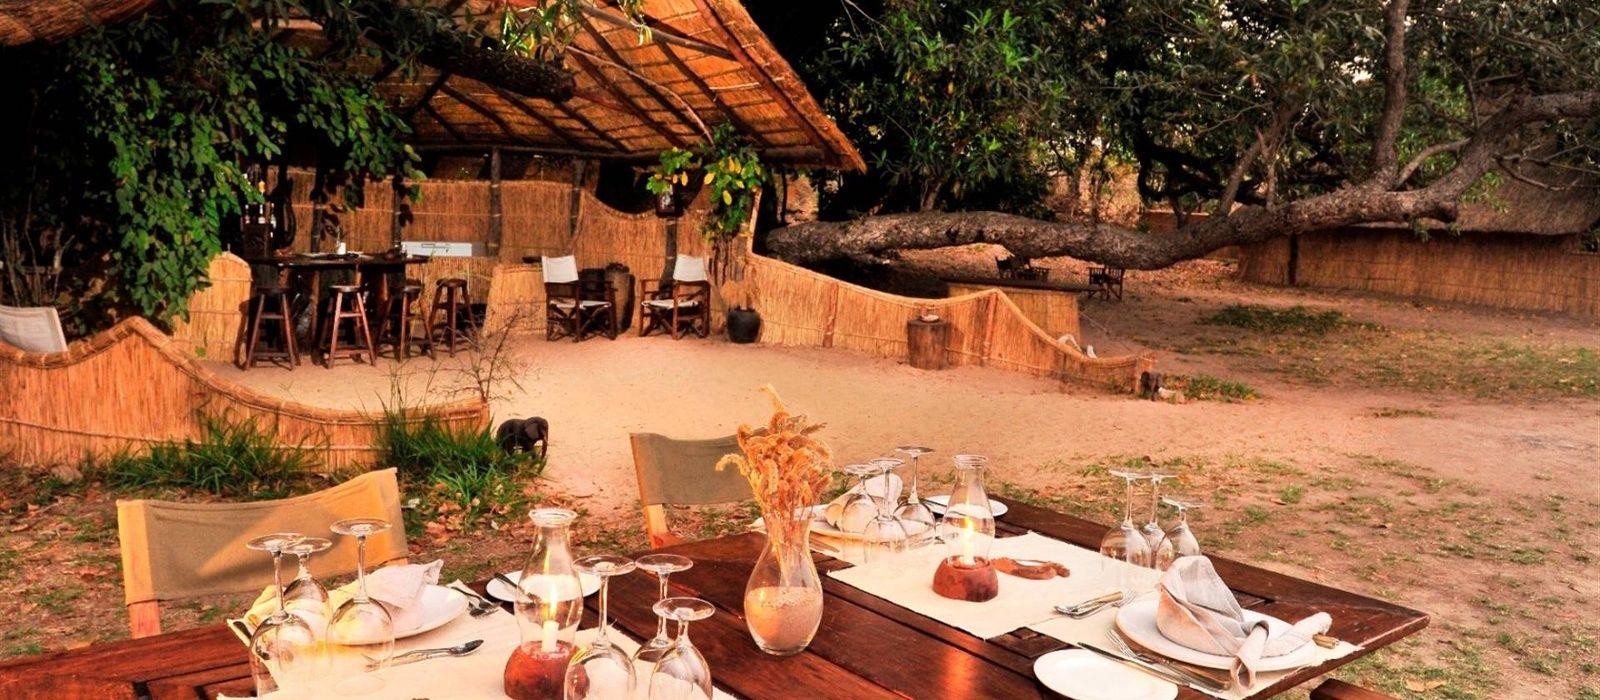 Hotel Luwi Bushcamp Zambia